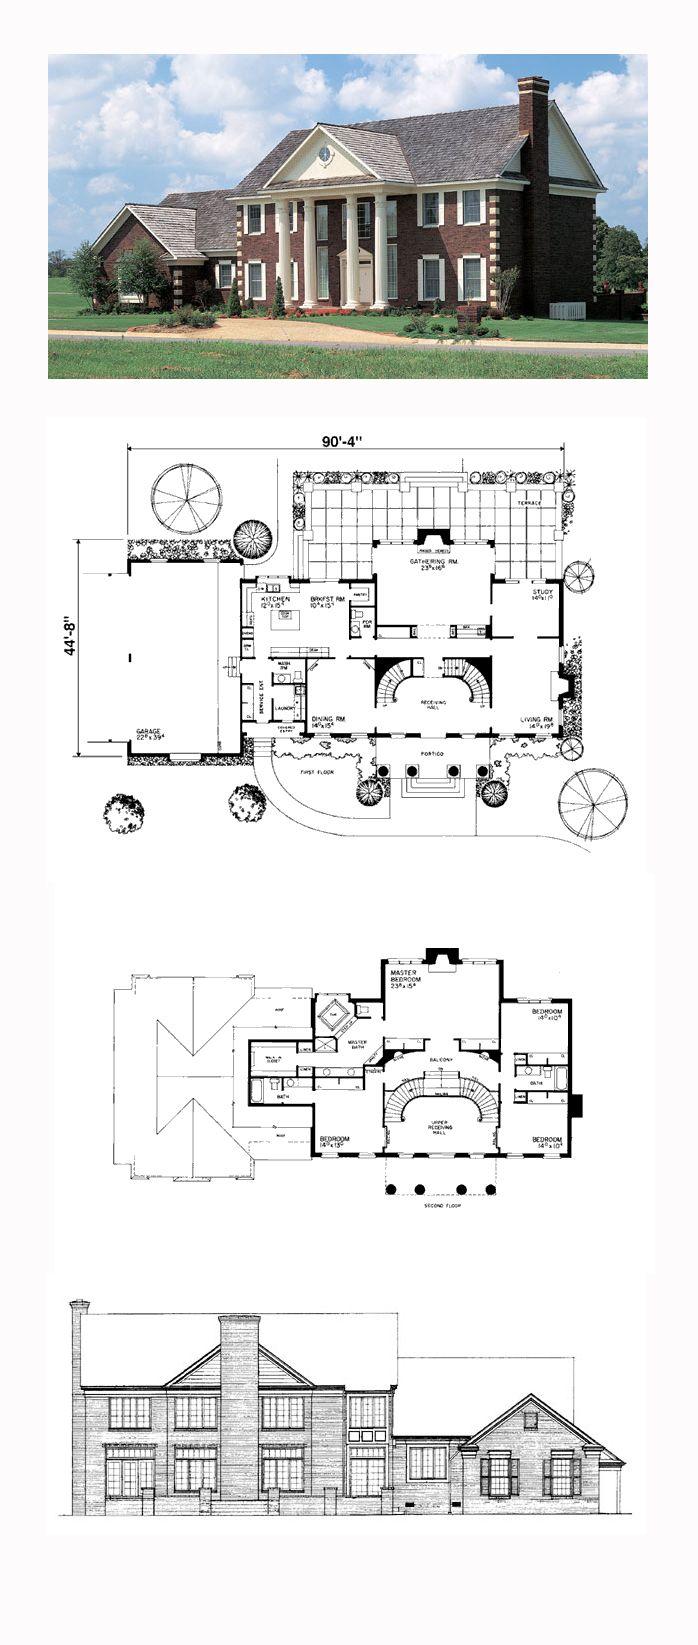 50 best plantation house plans images on pinterest for Plantation floor plans